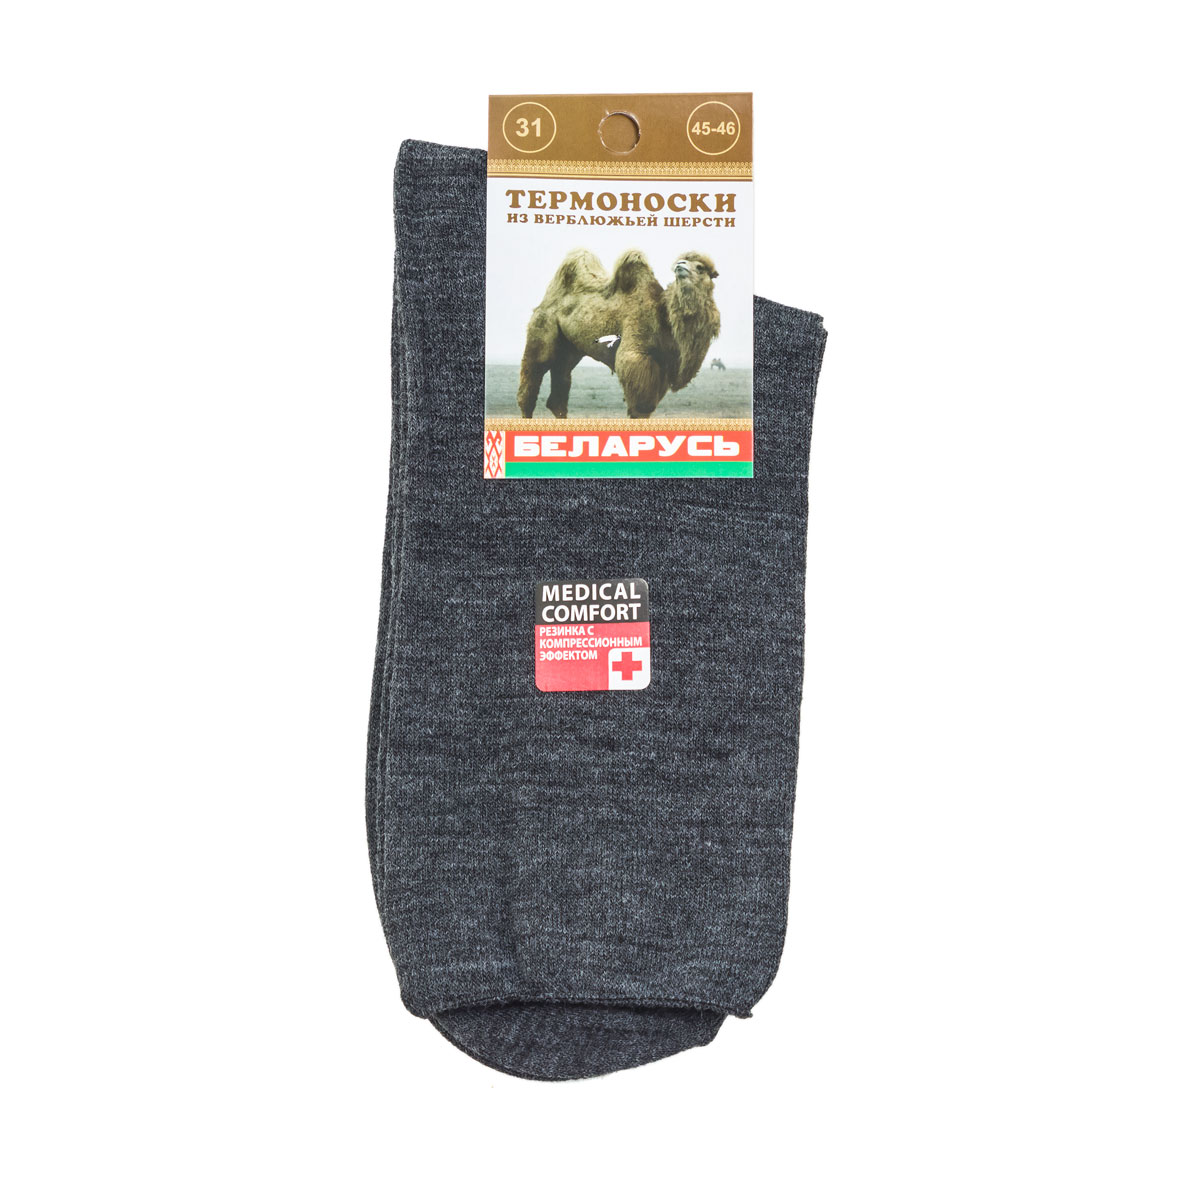 Муж. носки Беларусь р. 43-45Носки<br><br><br>Тип: Муж. носки<br>Размер: 43-45<br>Материал: Верблюжья шерсть